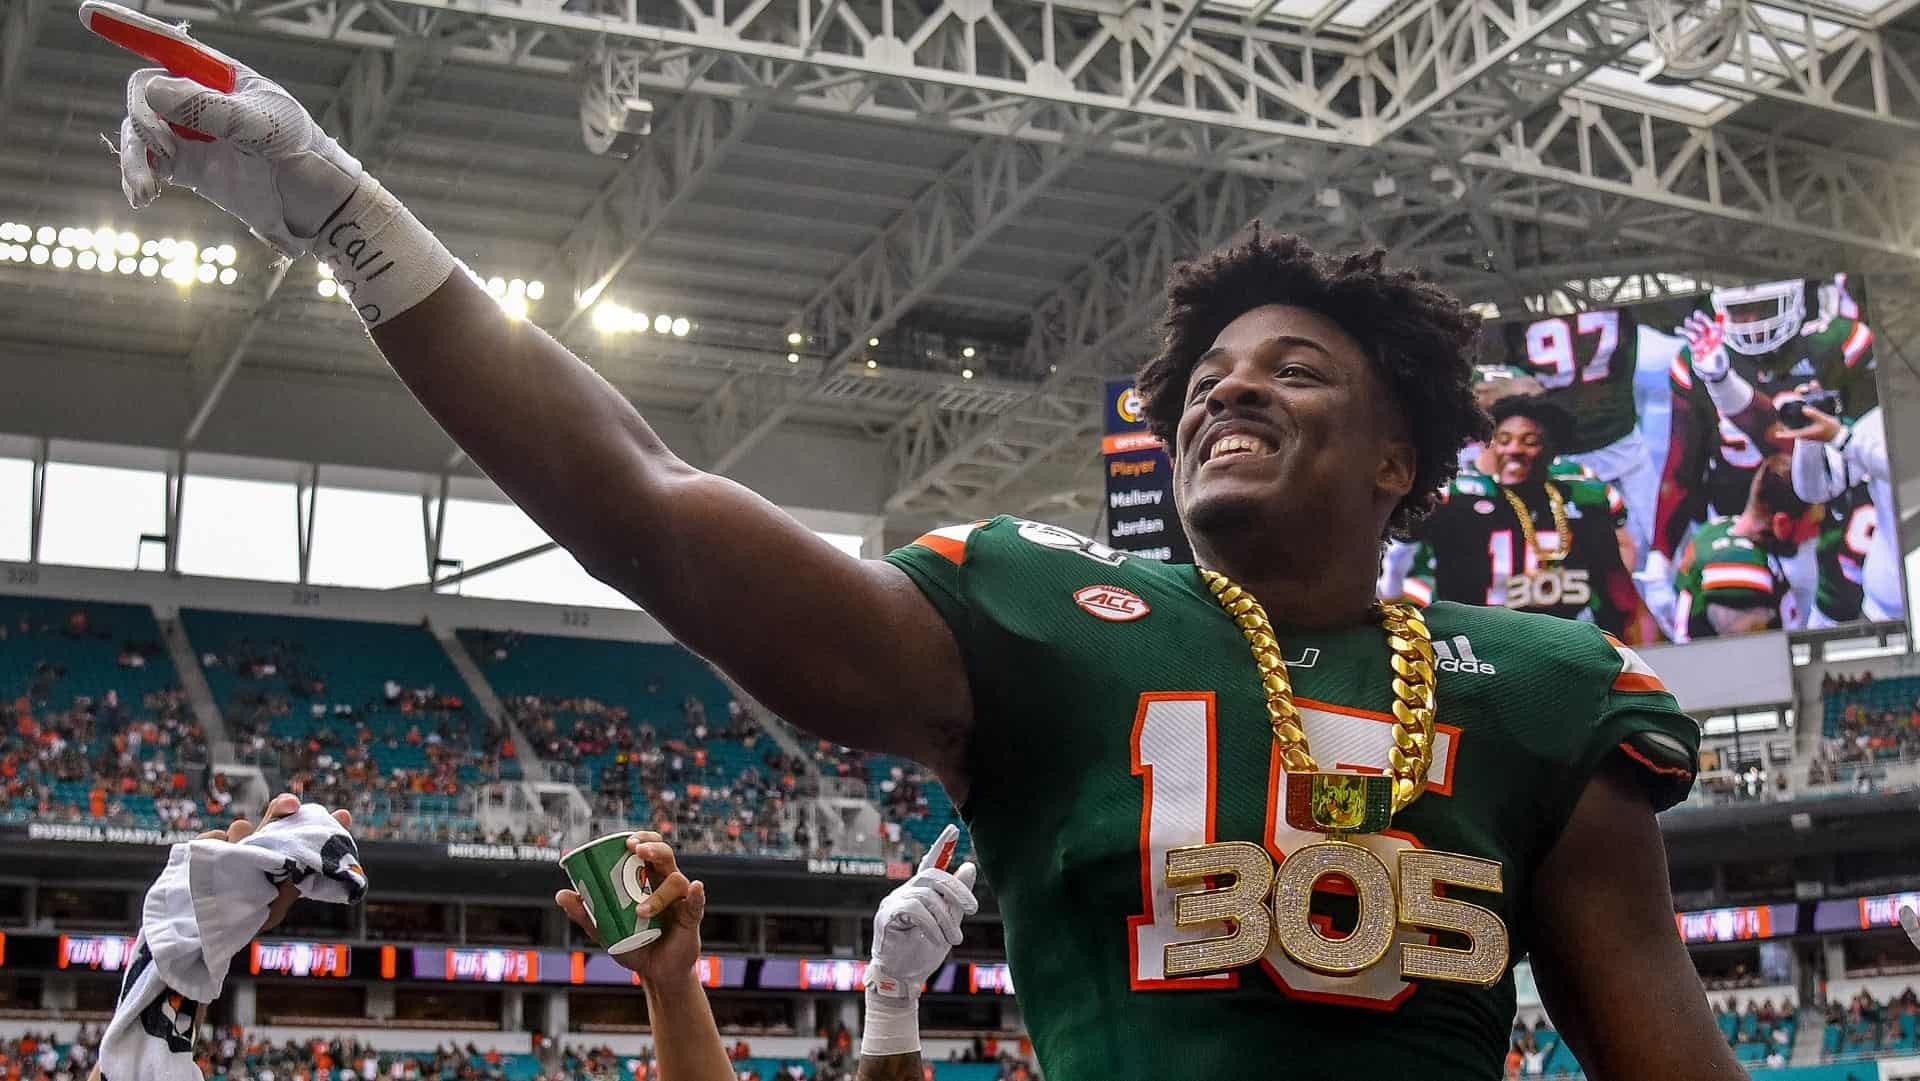 2021 NFL Draft: Rousseau leads top 5 edge rushers